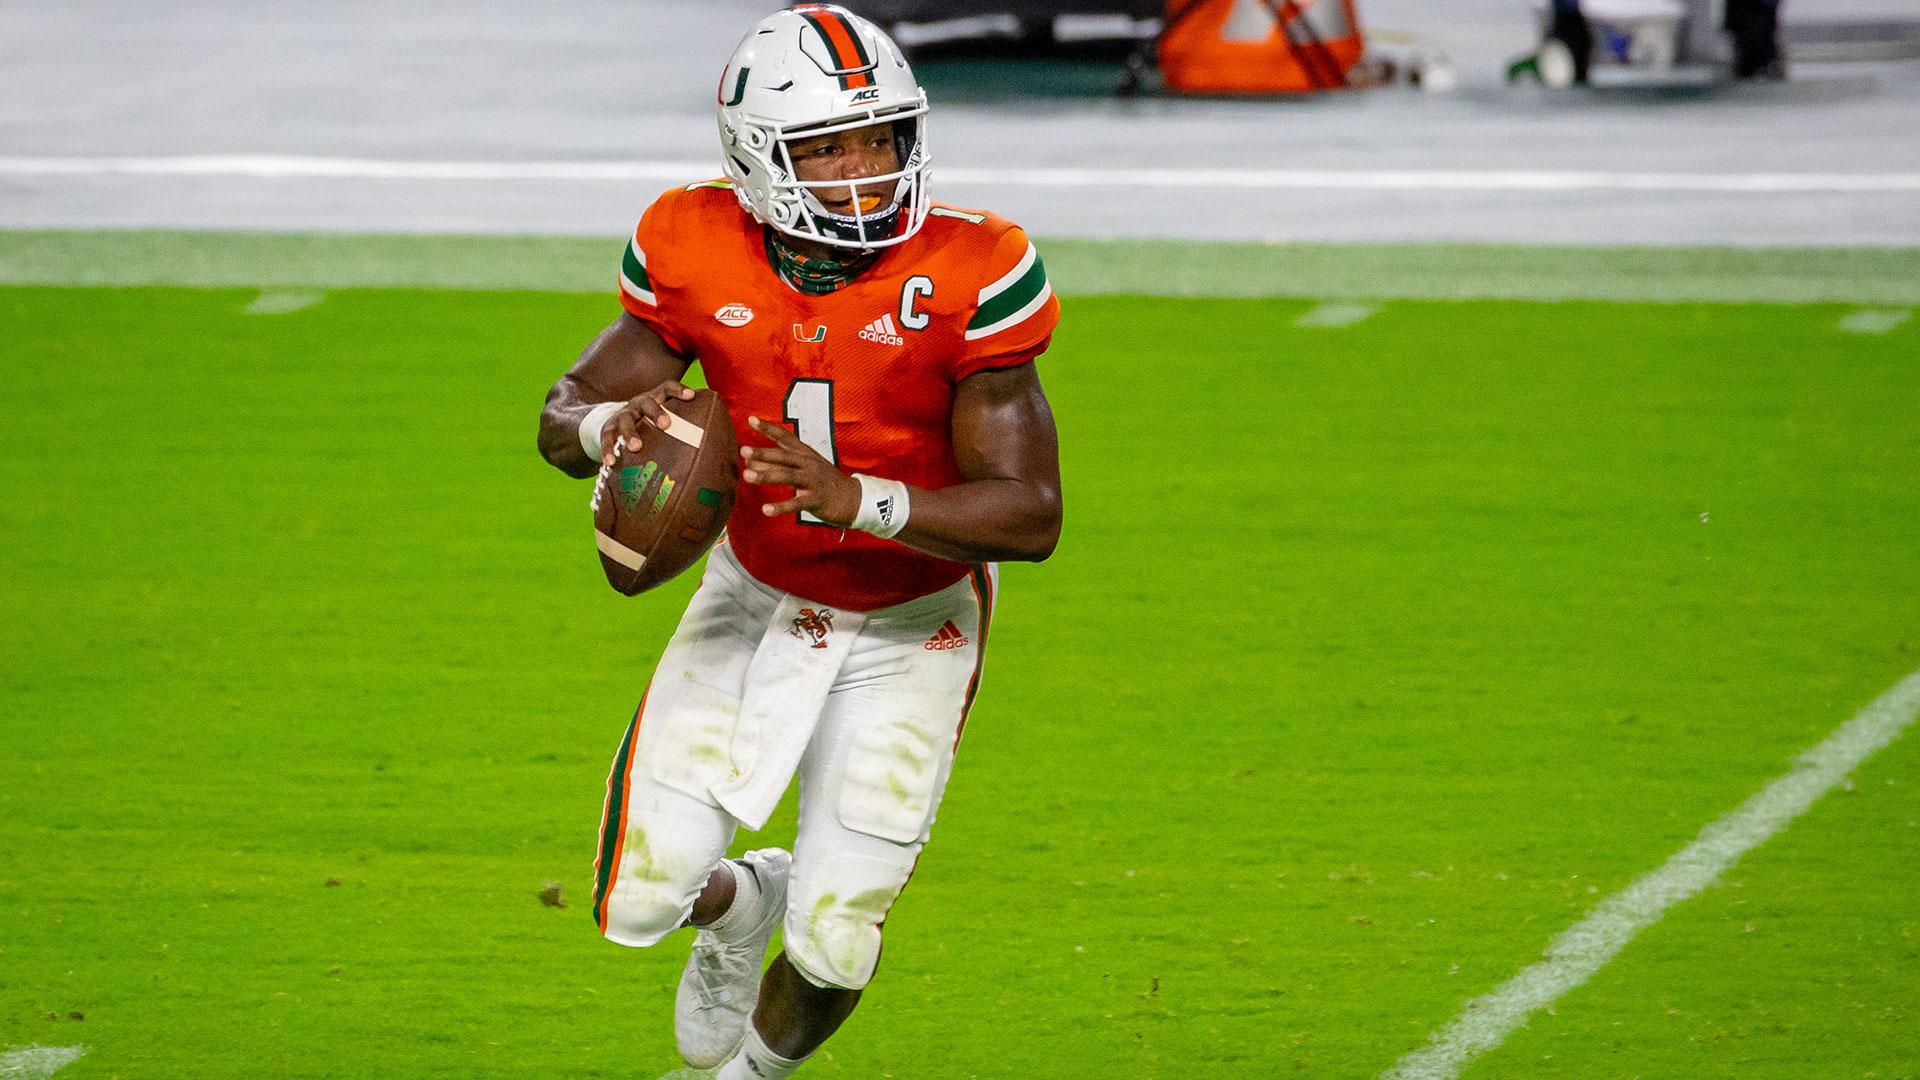 College football Week 6 primer: Heisman Watch, upset picks, predictions and more